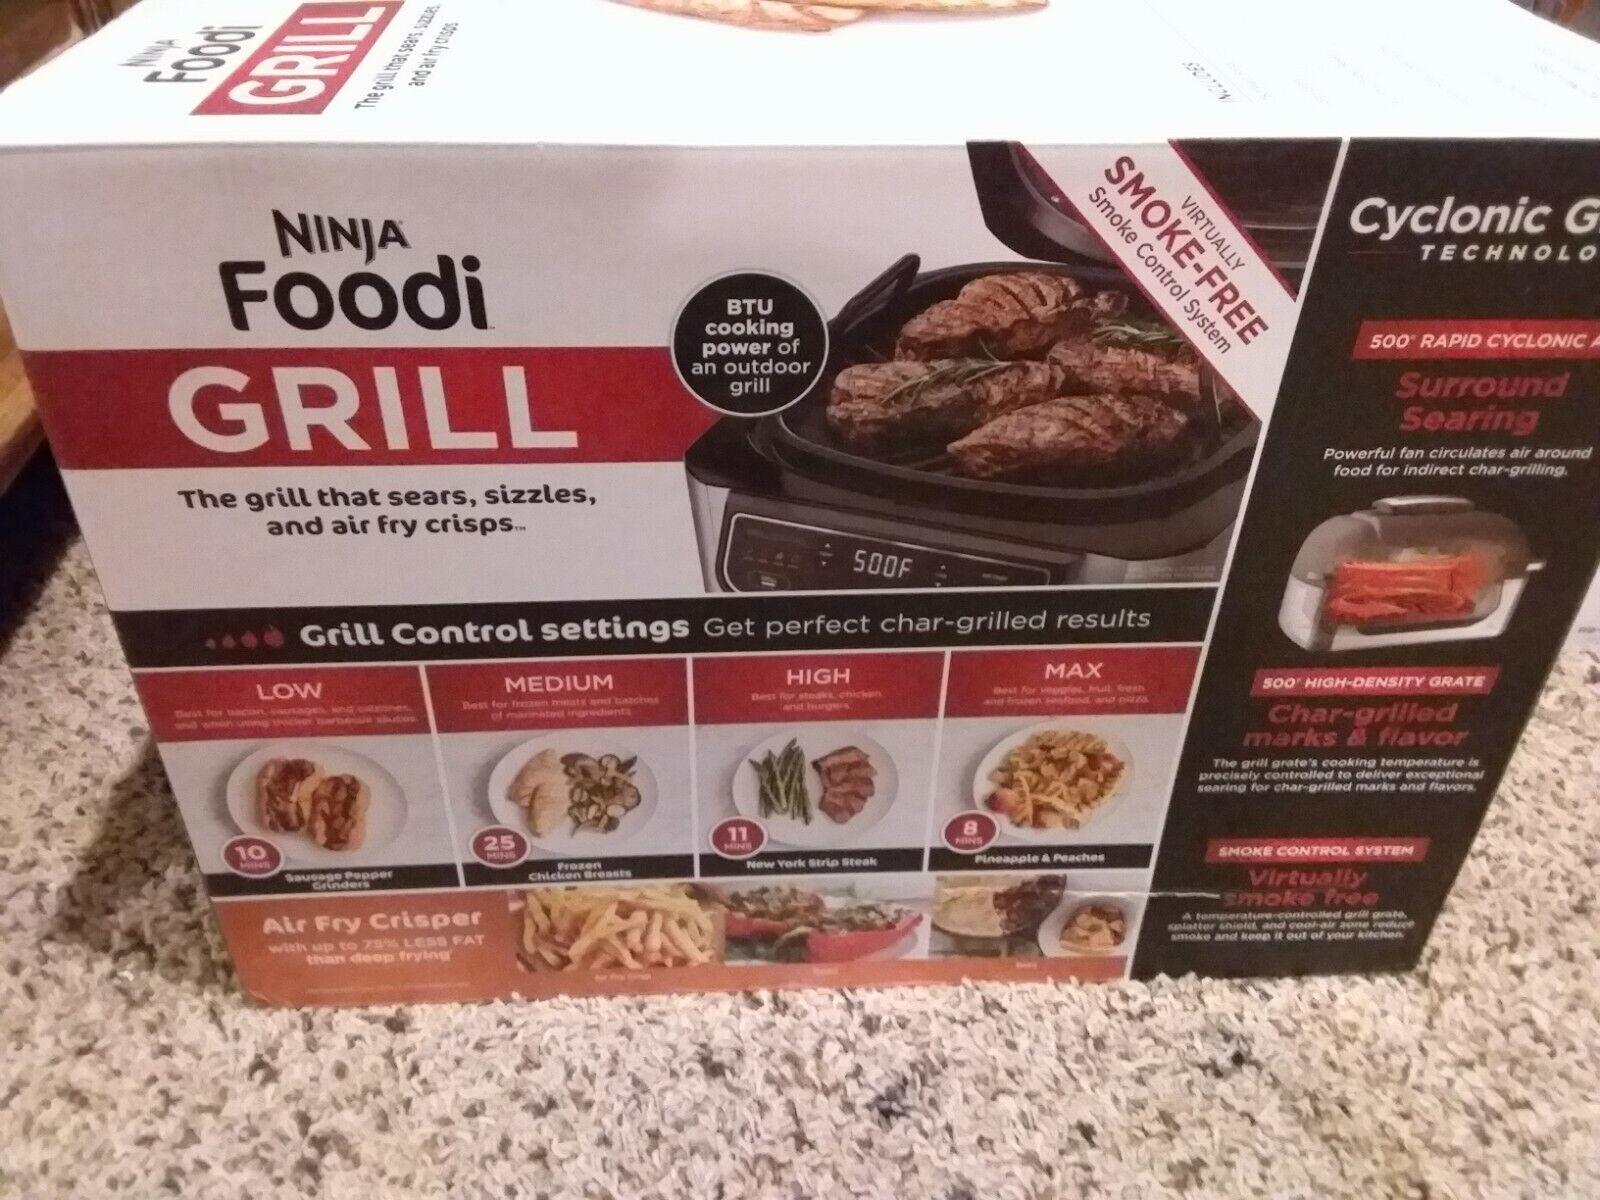 Ninja AG300 Foodi 4-in-1 Indoor Grill with 4 Quart Air Fryer